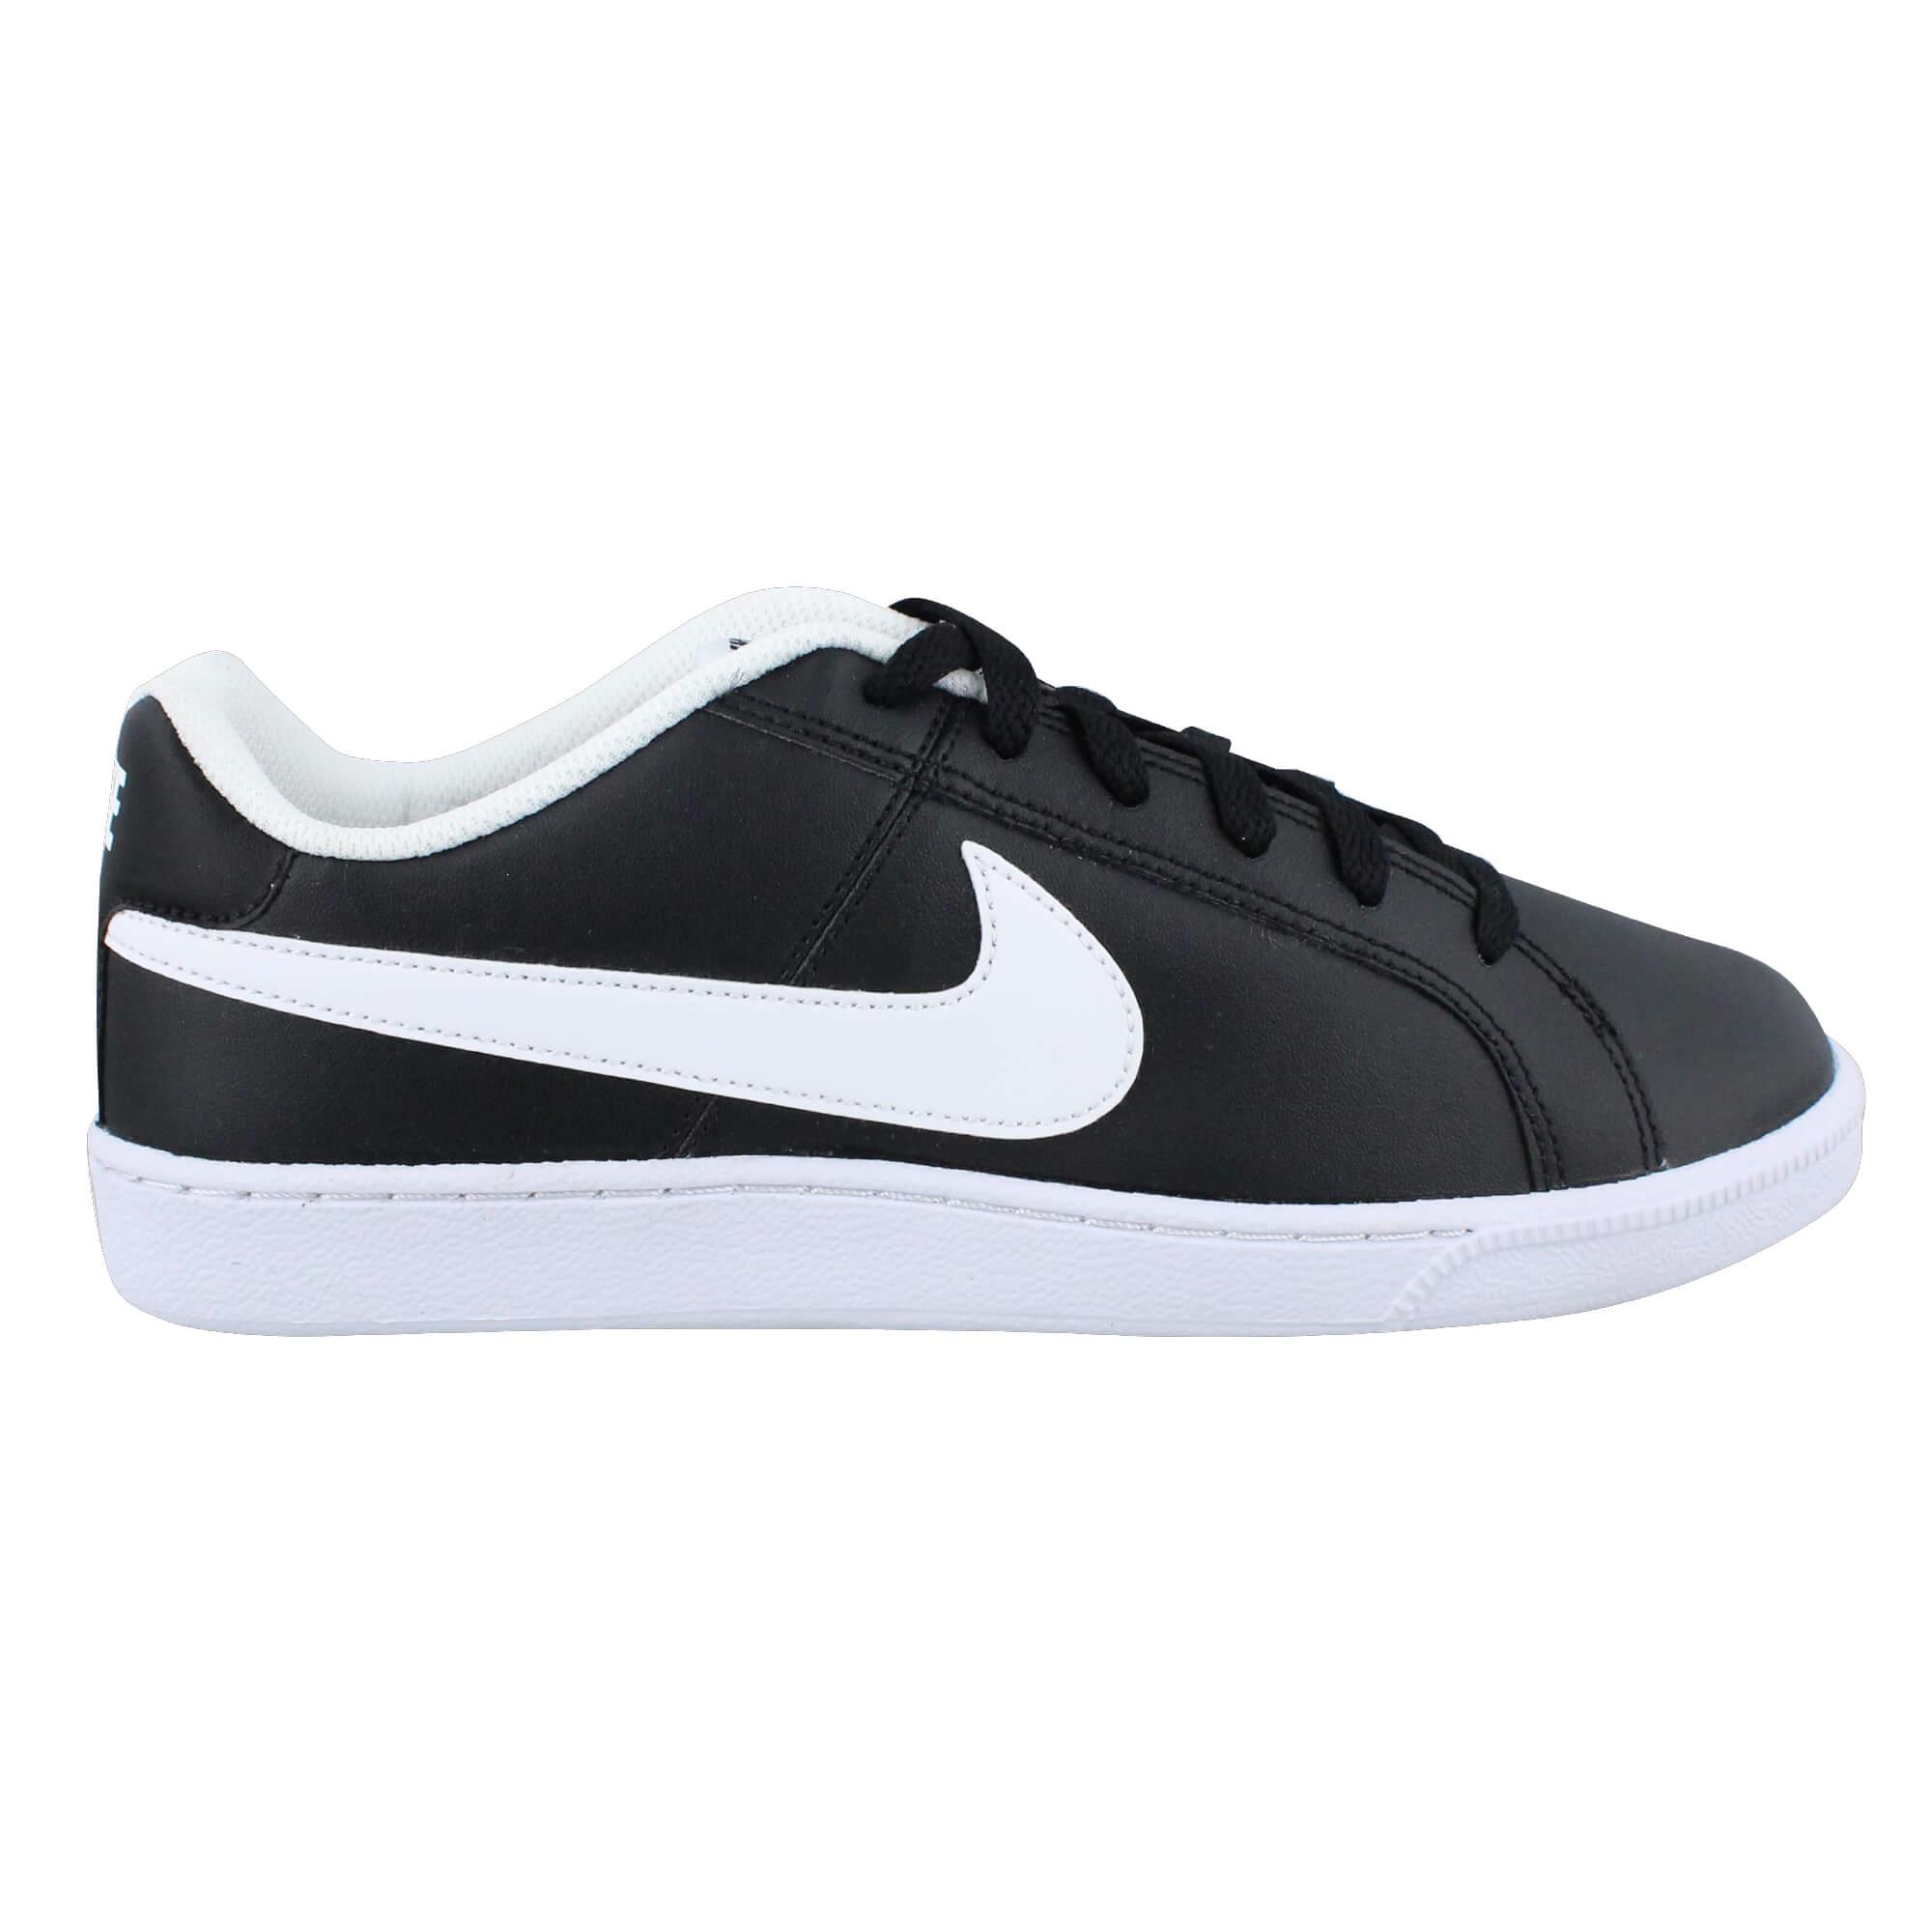 Court Royale Nike Oferta